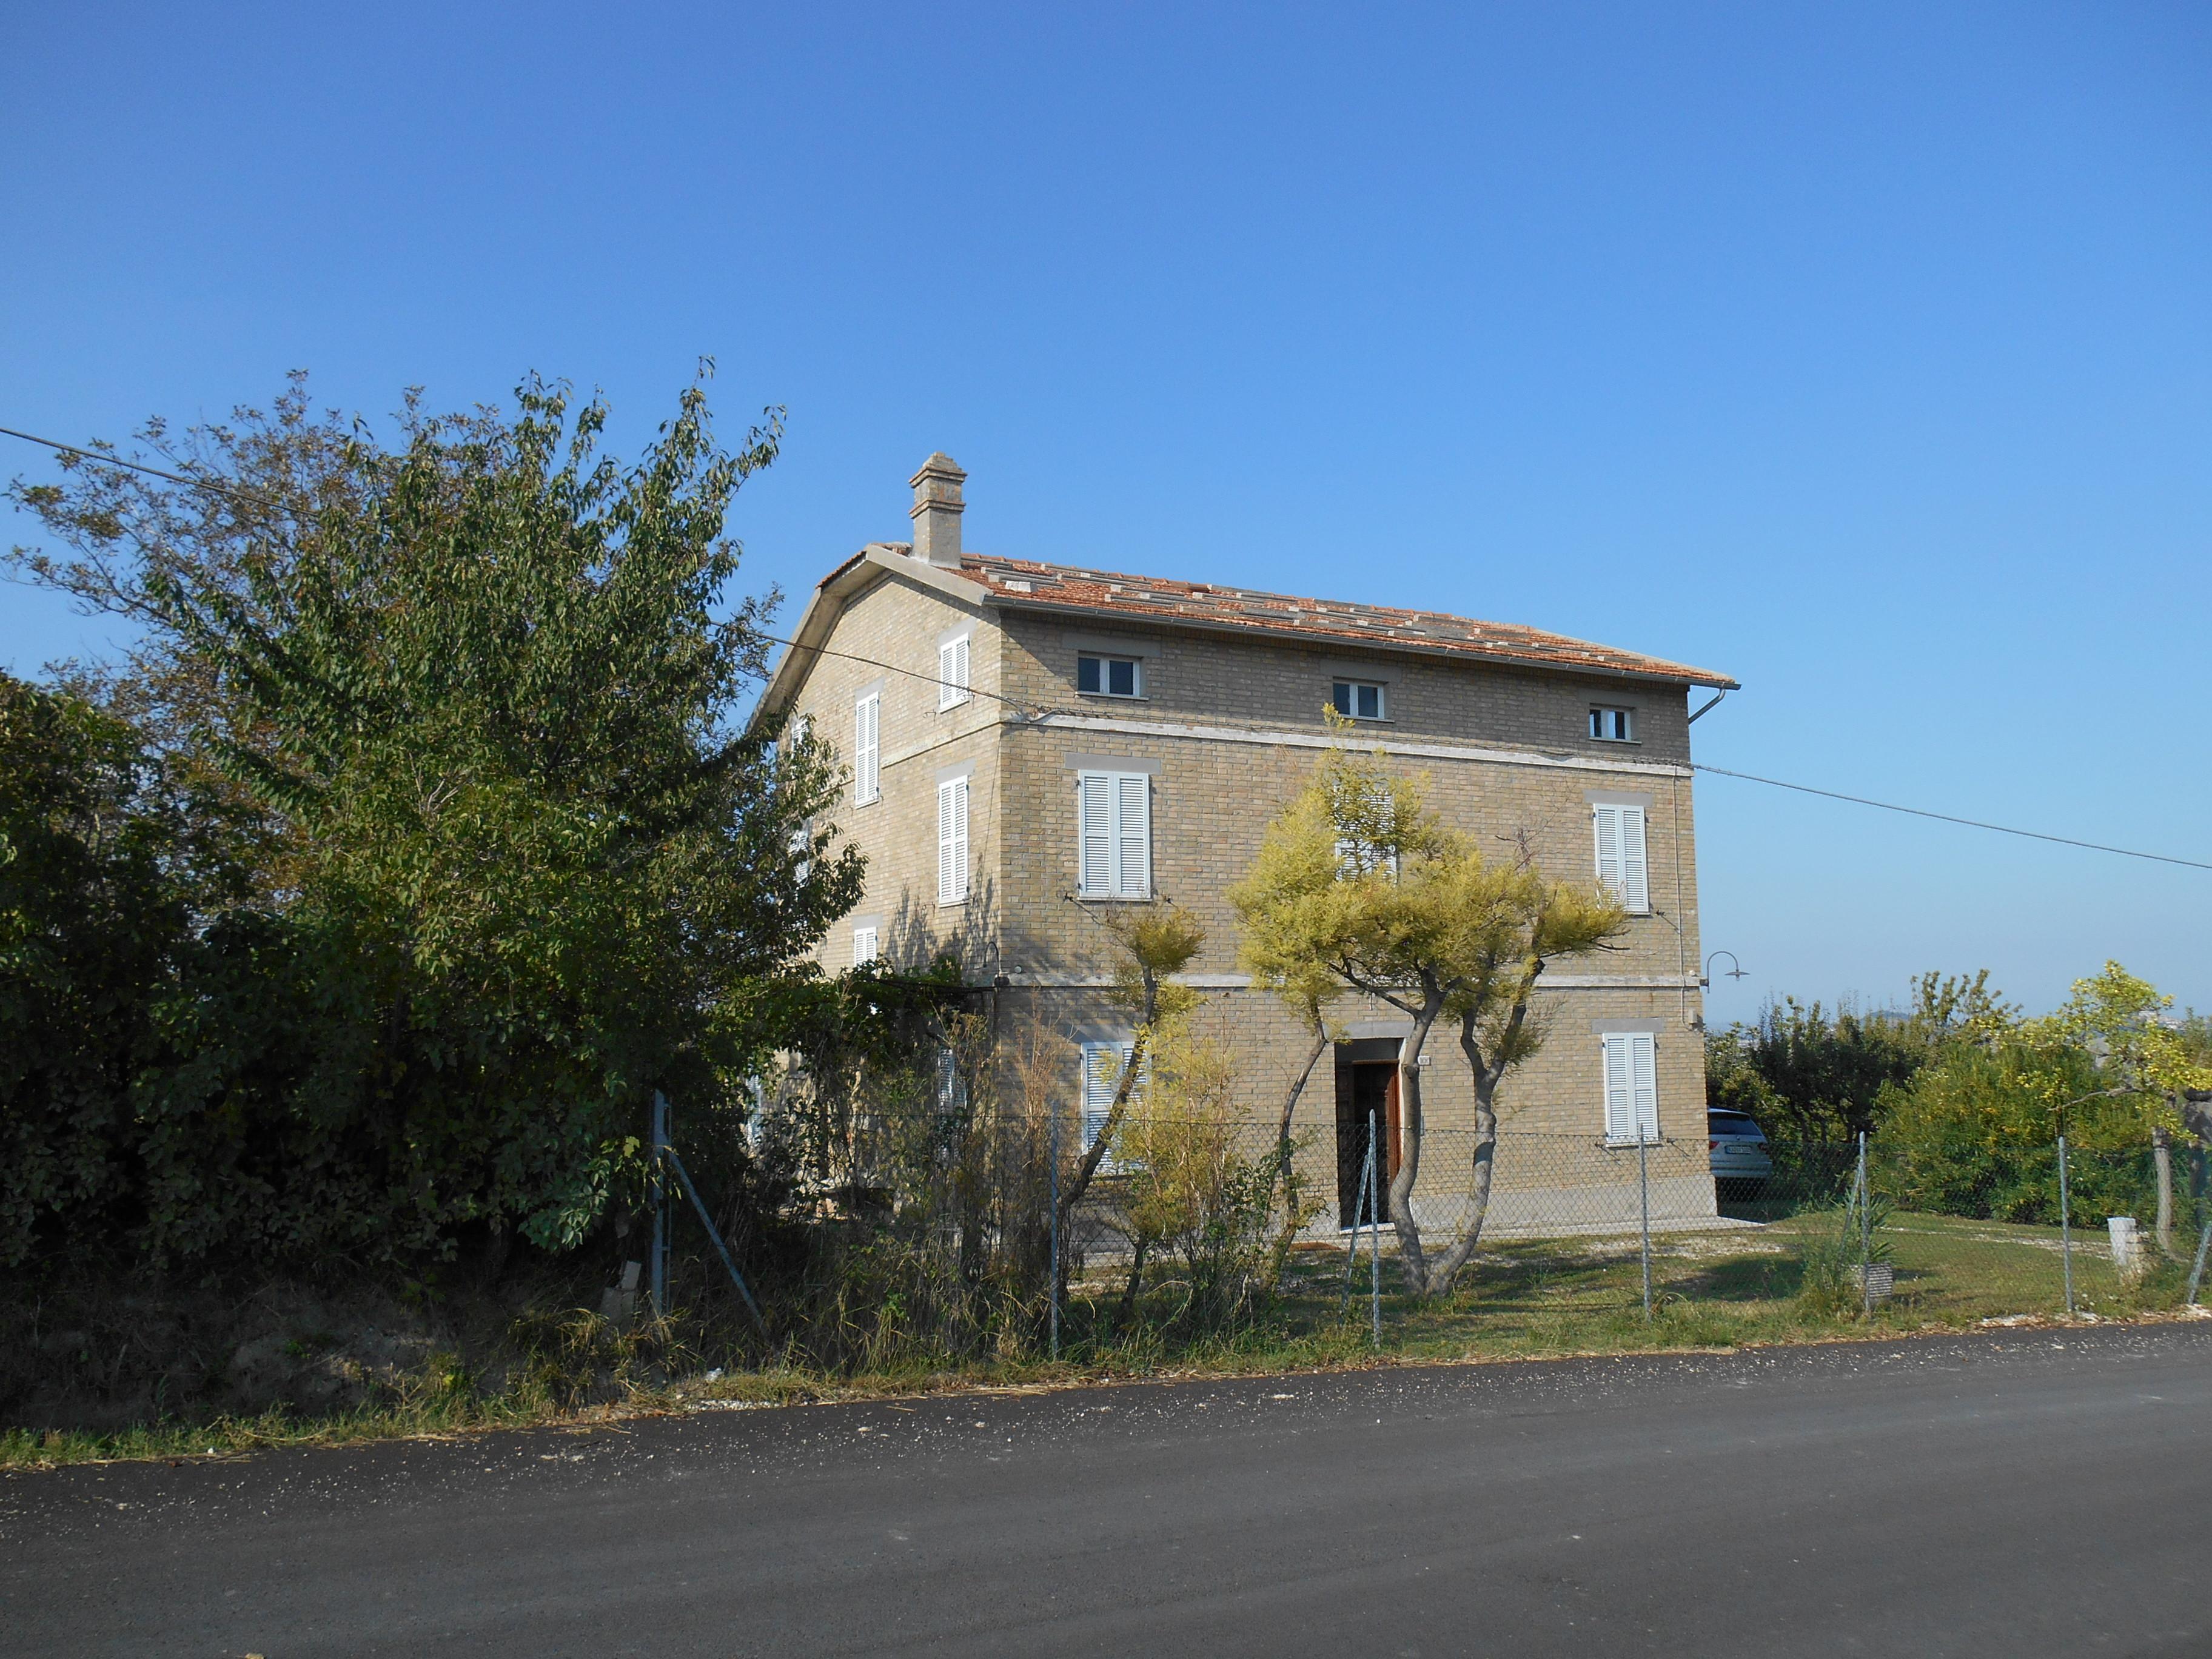 171 – Grande casale in campagna